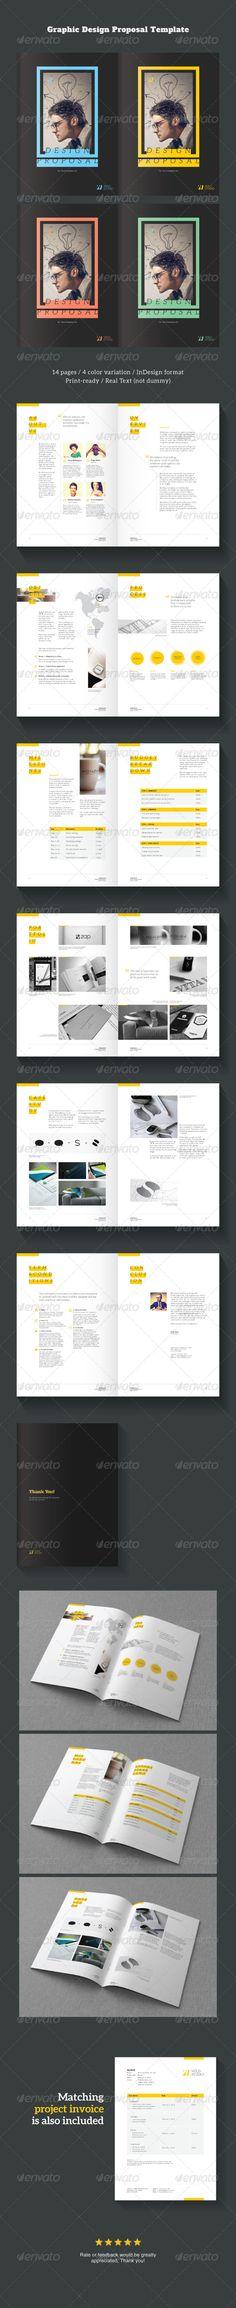 Elite Design ProposalMinimal and Professional Project Proposal - graphic design proposal template